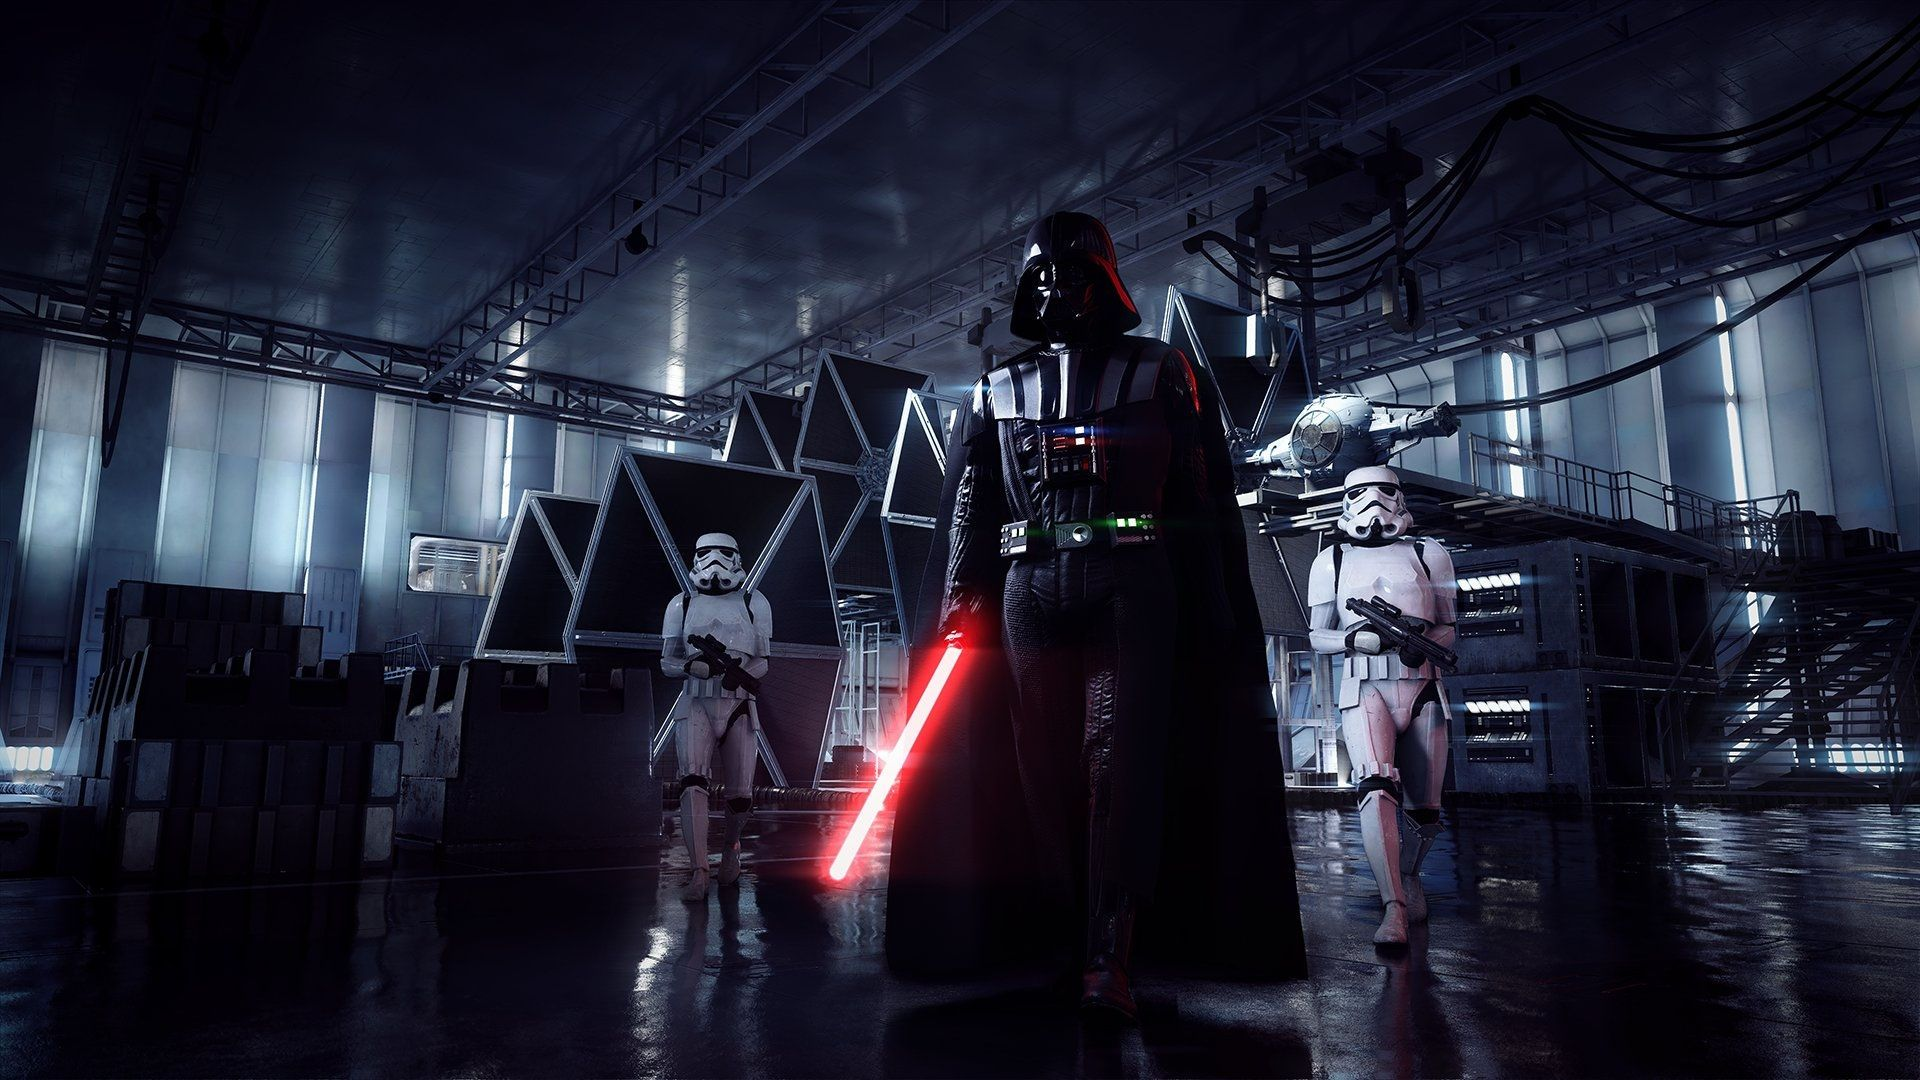 Star Wars Battlefront Ii Darth Vader Star Wars Wallpaper Battlefront Star Wars Canon